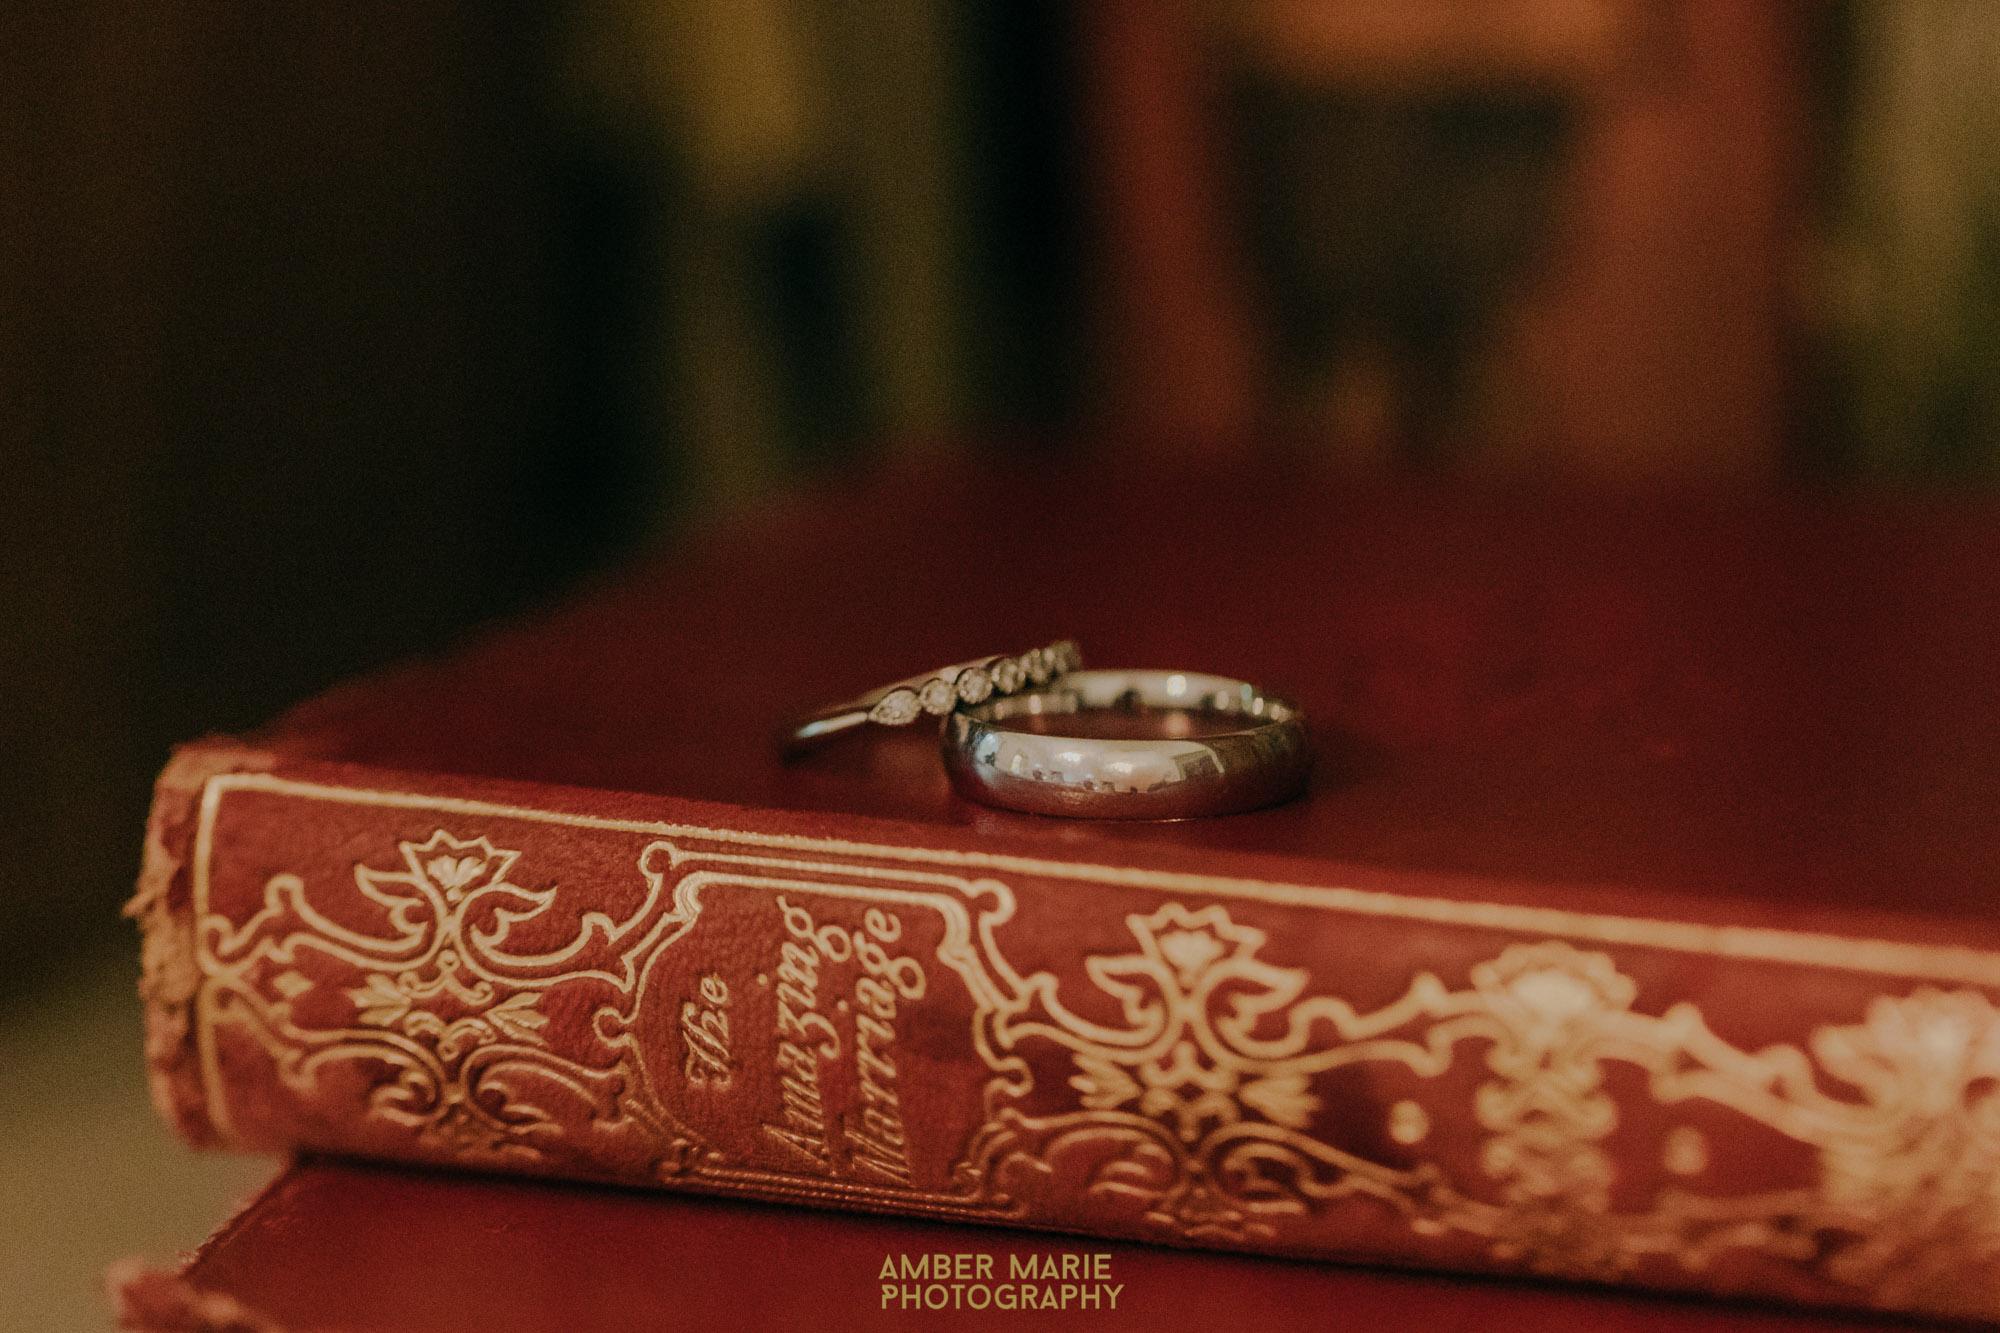 modern wedding photo of wedding rings on a classic hardback book 'the amazing marriage'